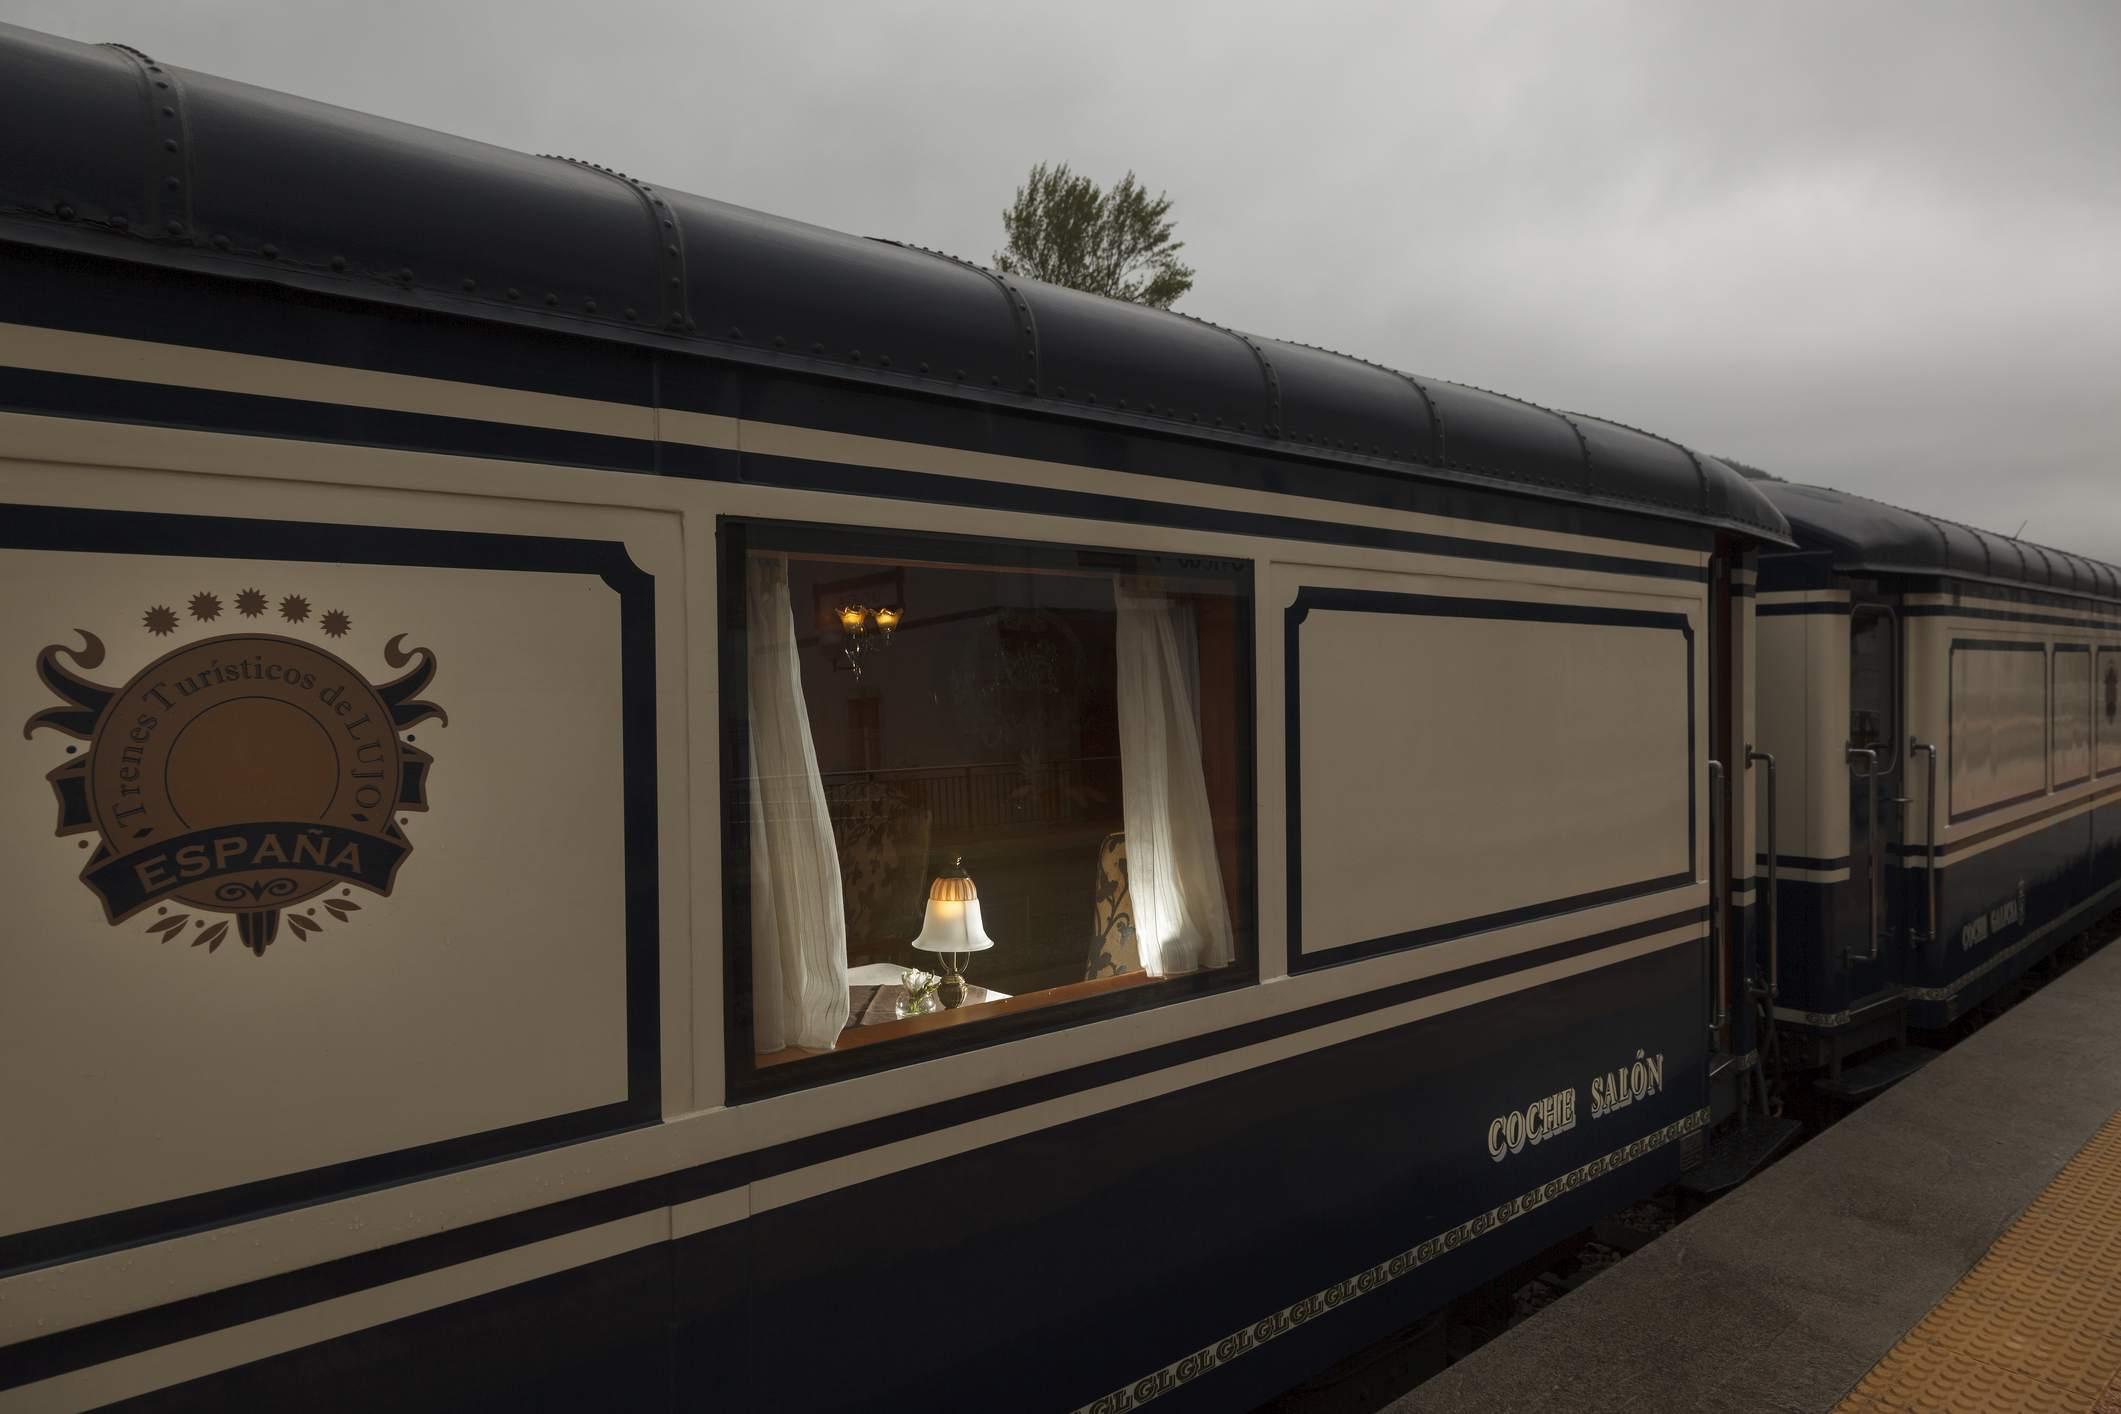 Transcantabrico luxury train